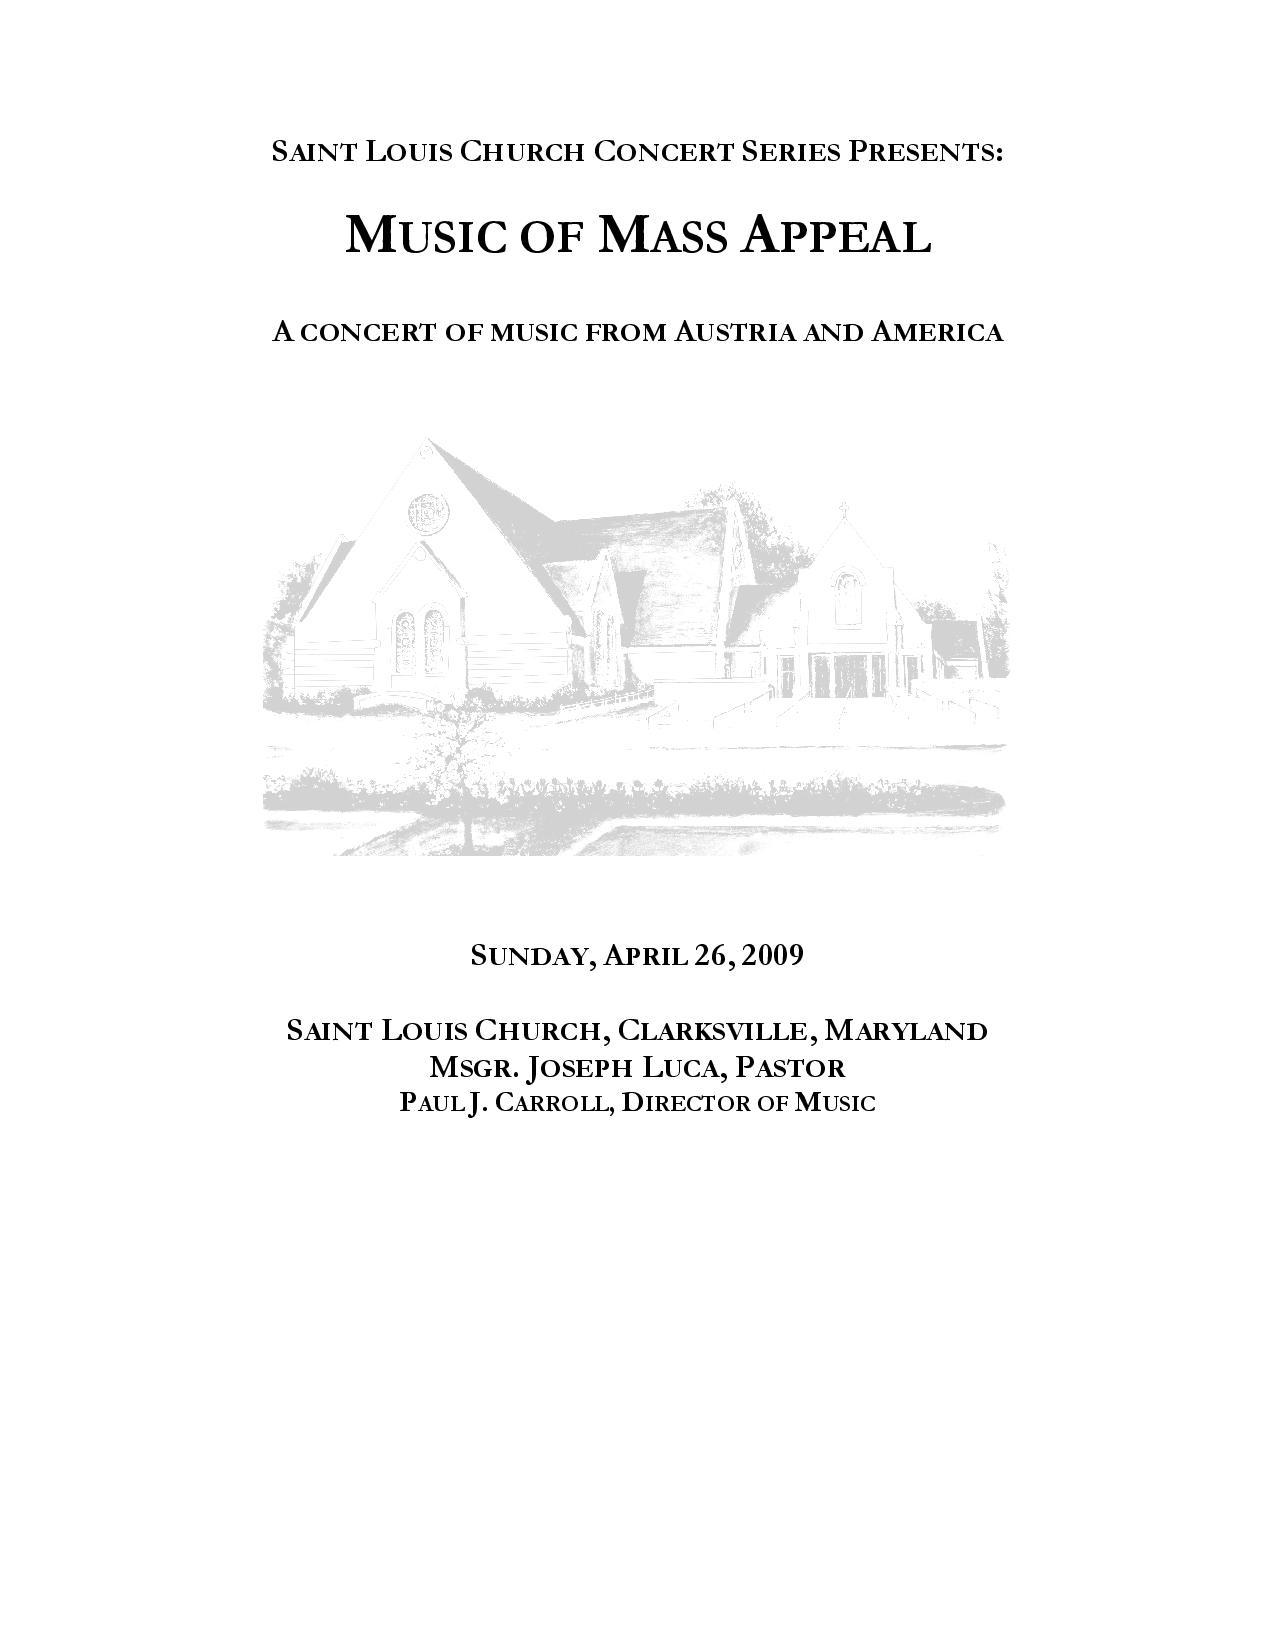 2009-04-26 - Program for Printing-page-001.jpg